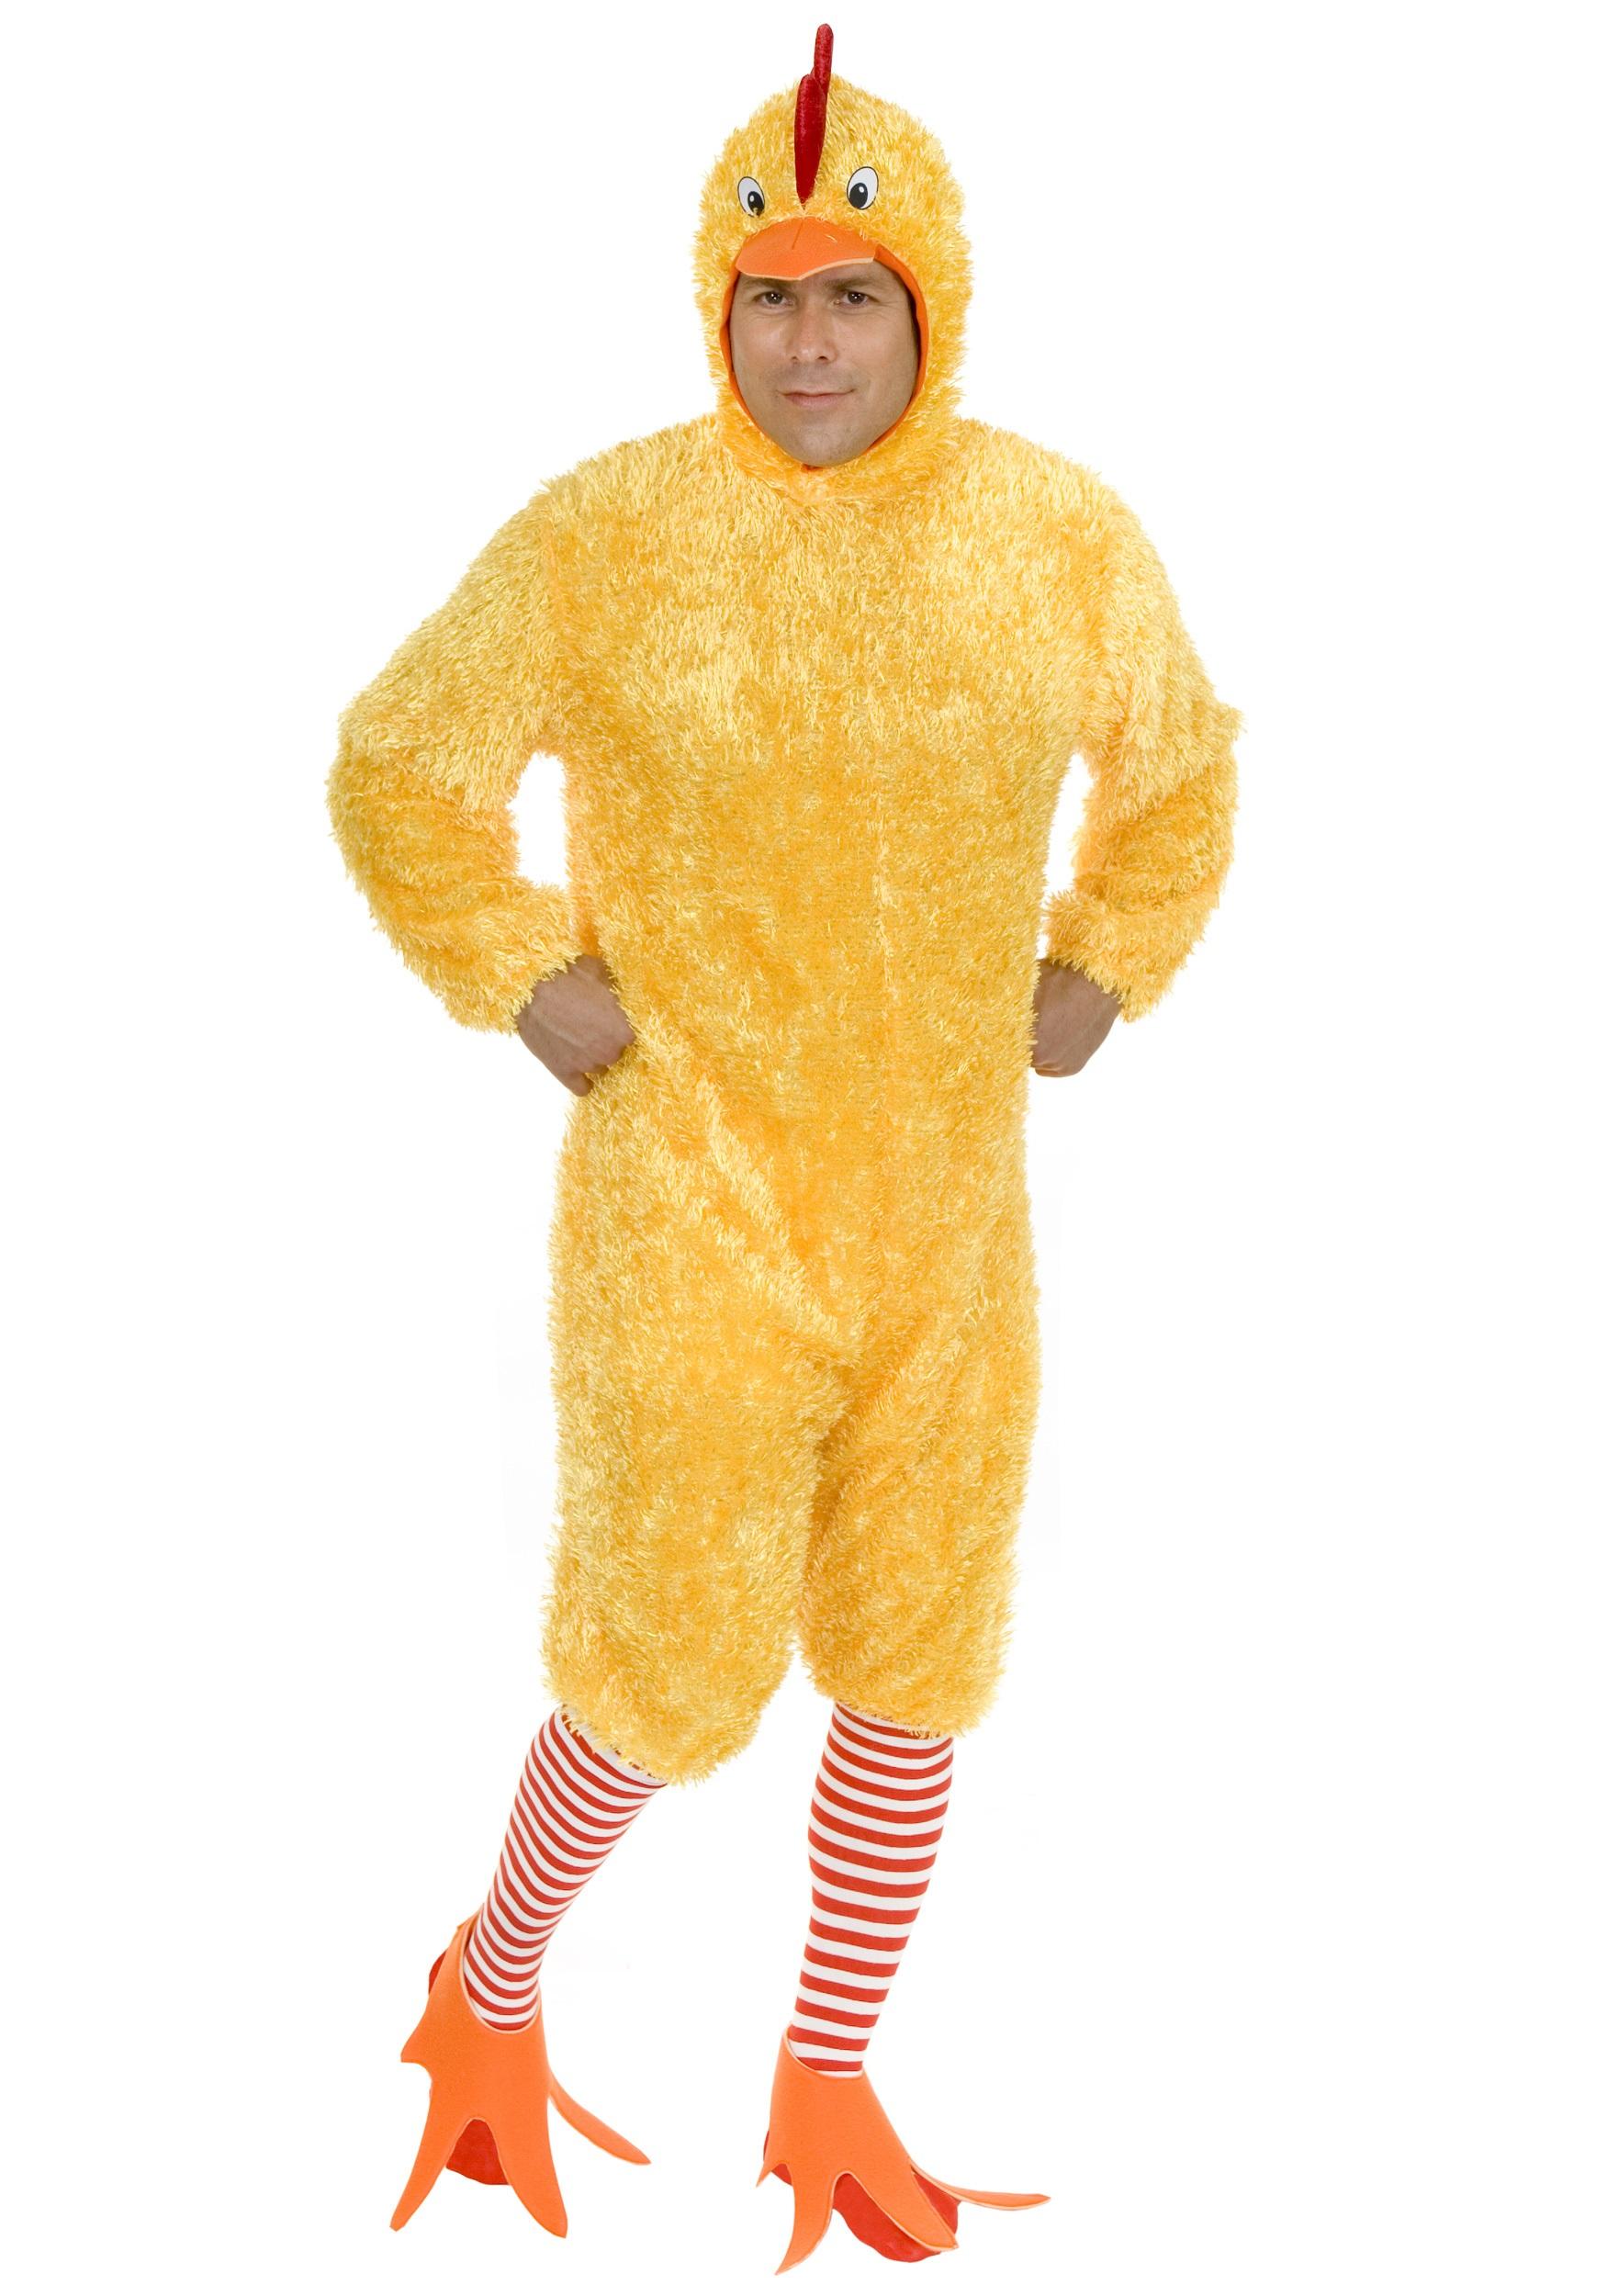 Funky Chicken Costume  sc 1 st  Halloween Costumes & Bird Costumes for Kids u0026 Adults - HalloweenCostumes.com